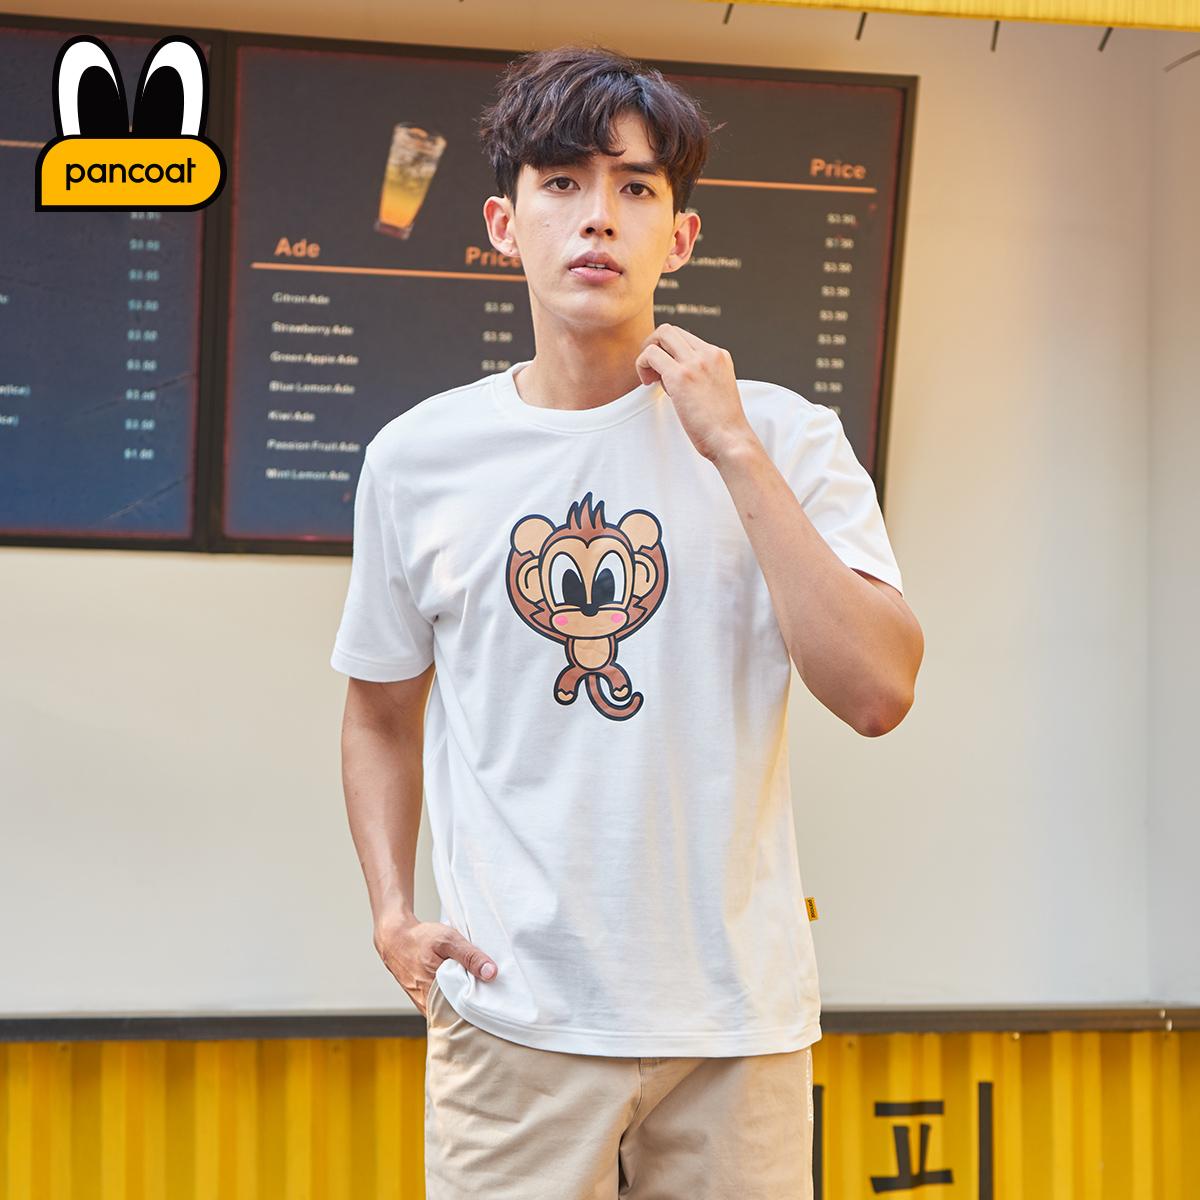 PANCOAT潮流韩版圆领T恤男款猴子印花宽松短袖PCATE182072M